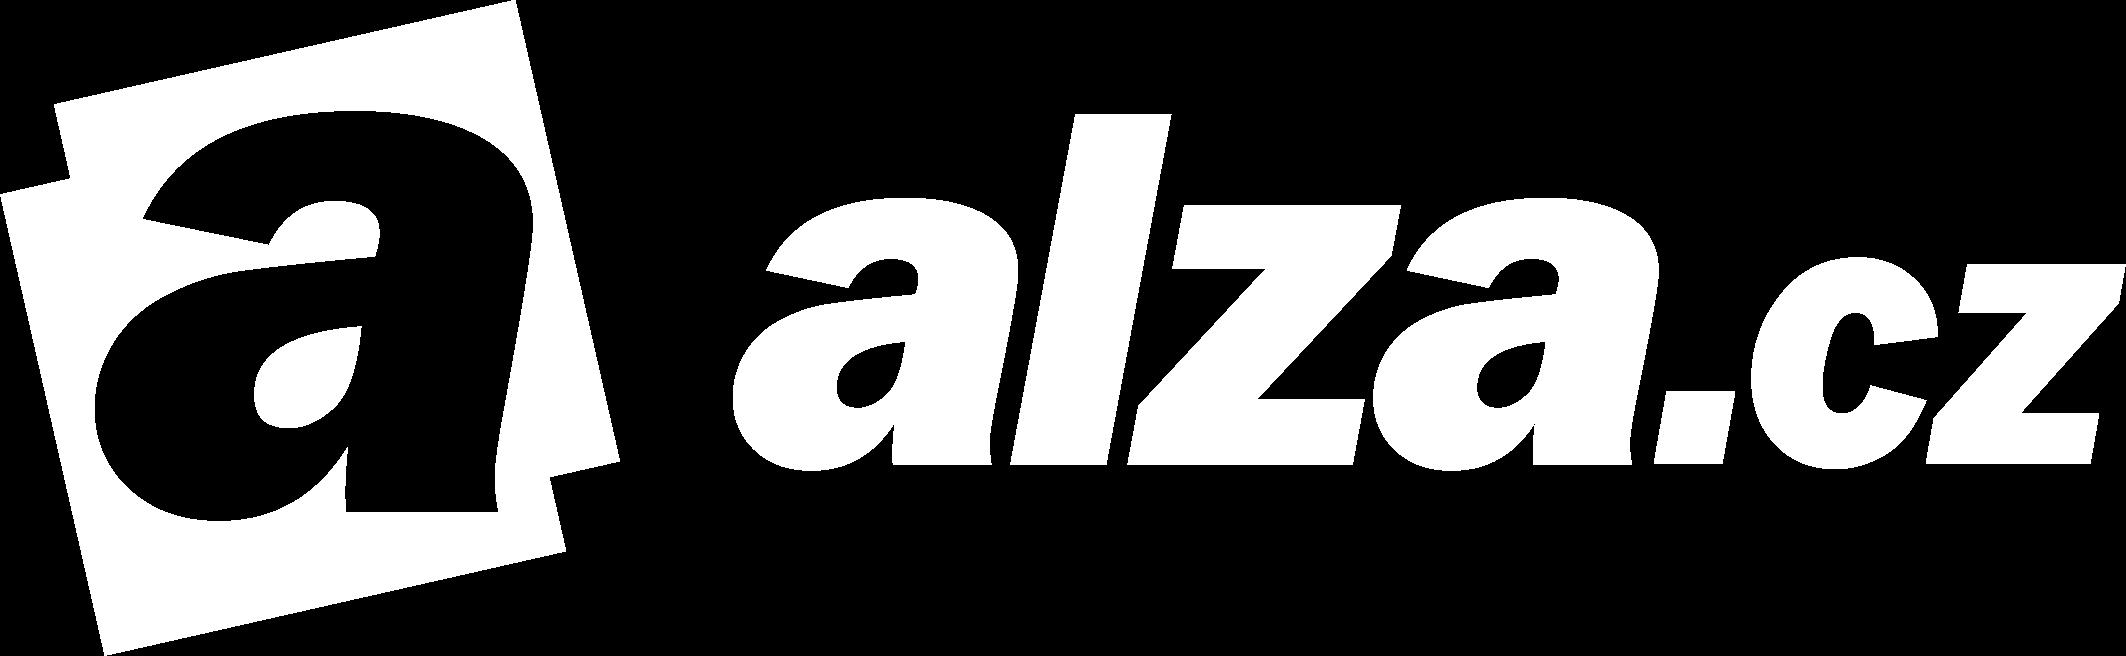 alza_cz bile_10 [converted].png